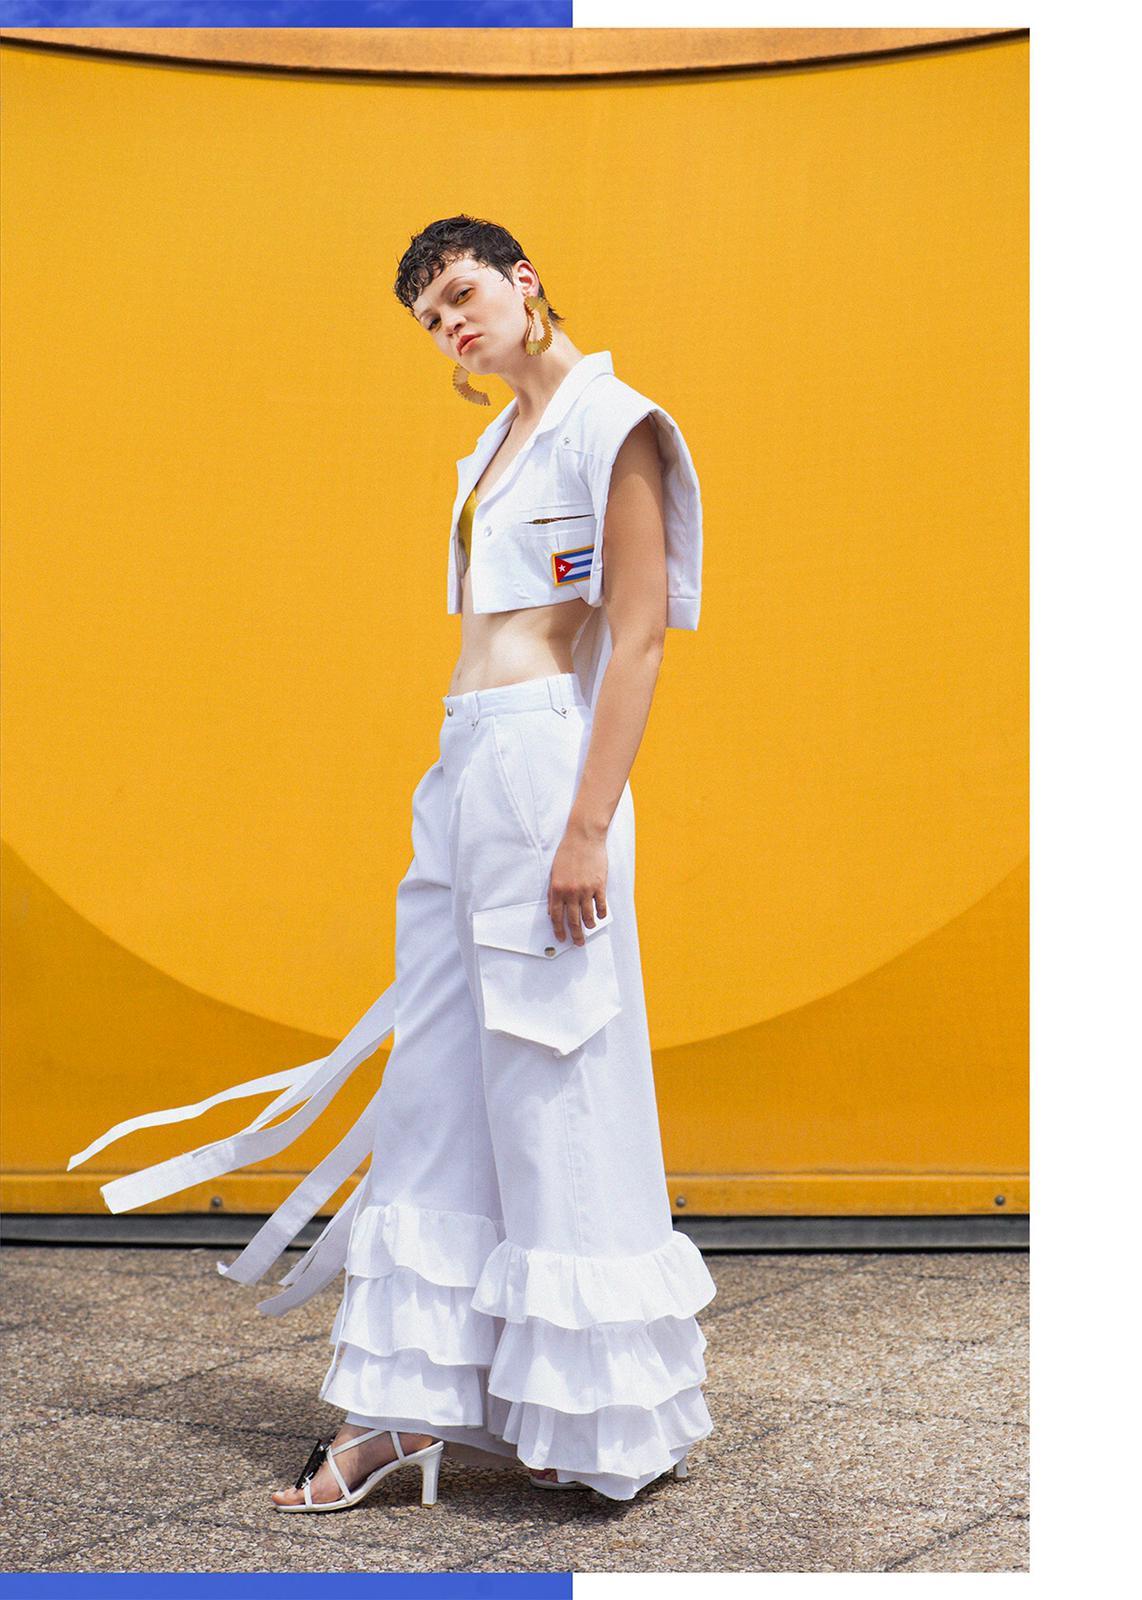 Fashion Design alum news : Ruben Zamora-Vargas